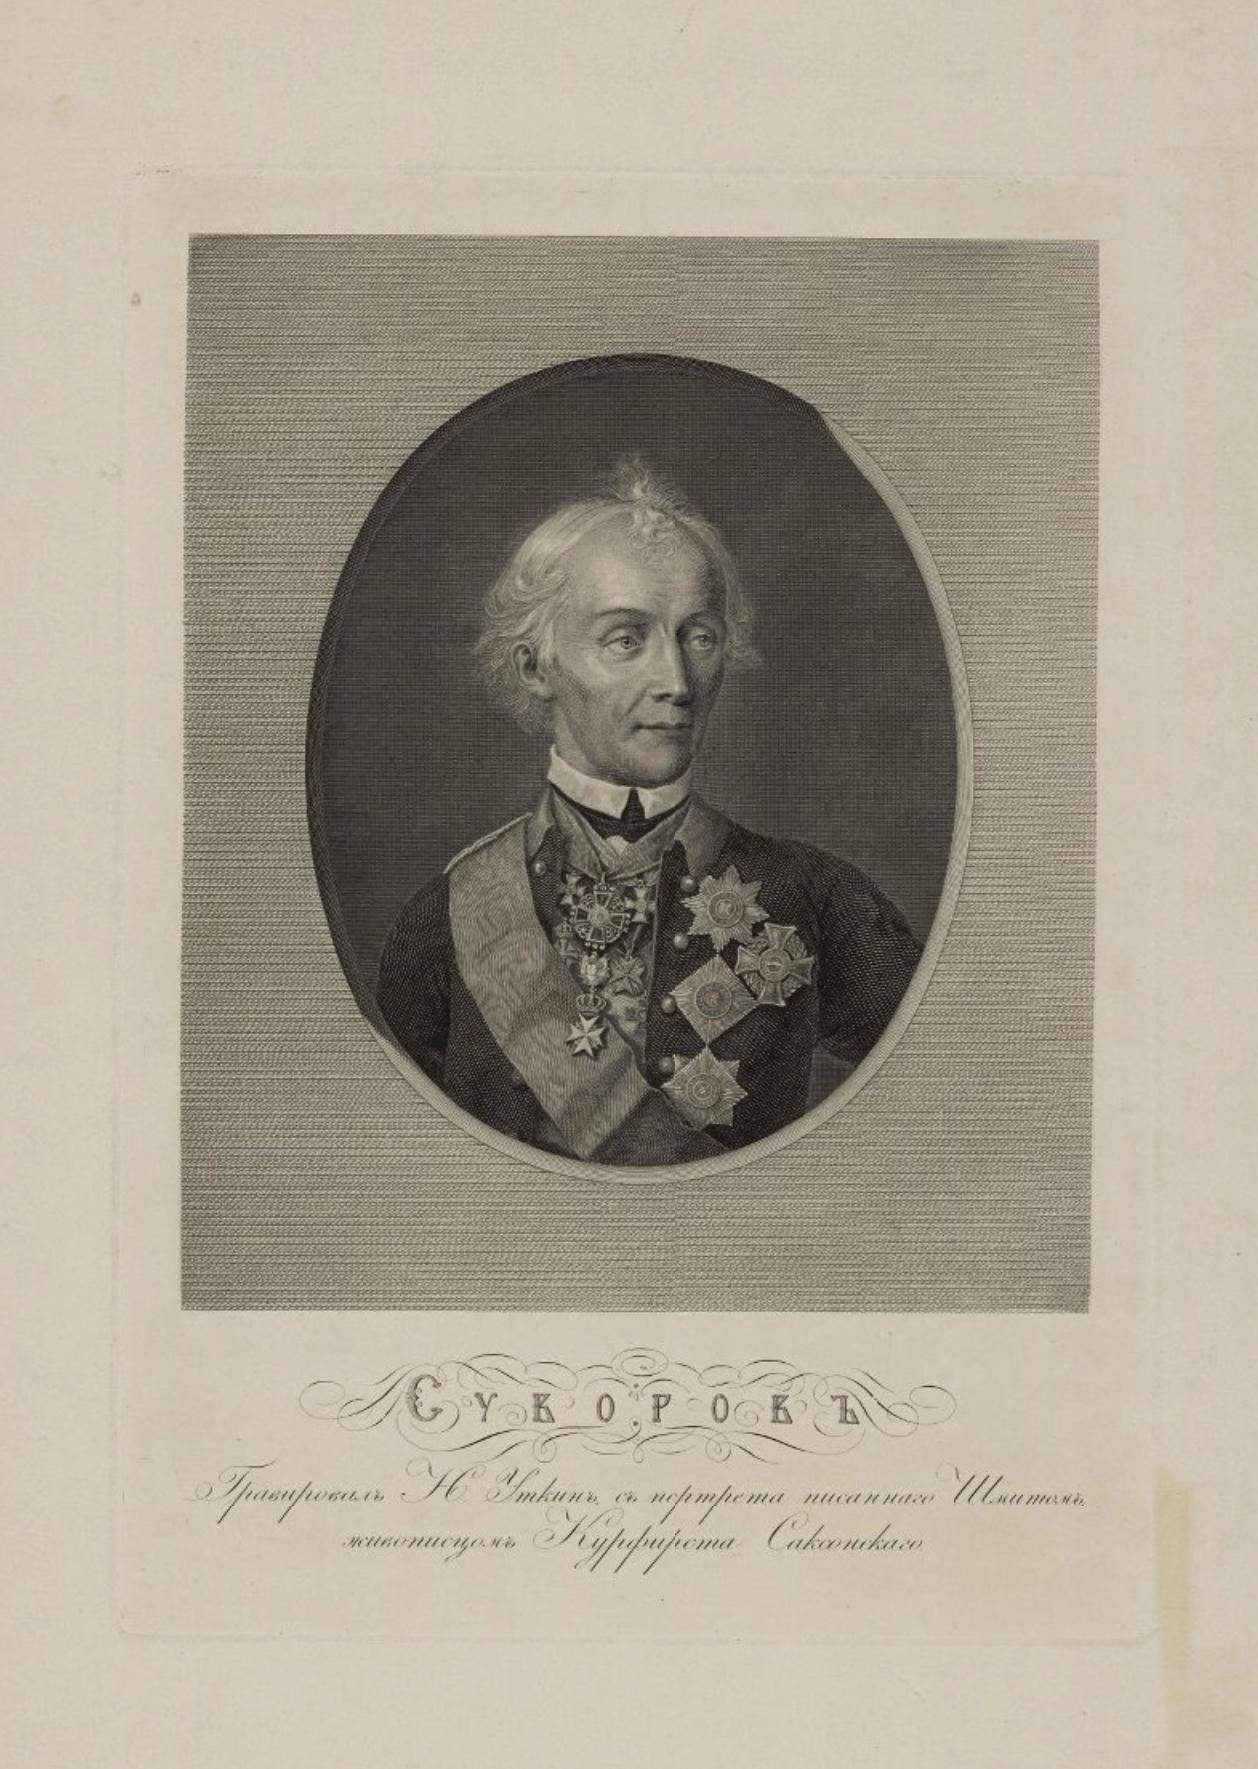 Александр Васильевич Суворов. Н. Уткин. Россия, 1818 г. Бумага, резец, офорт